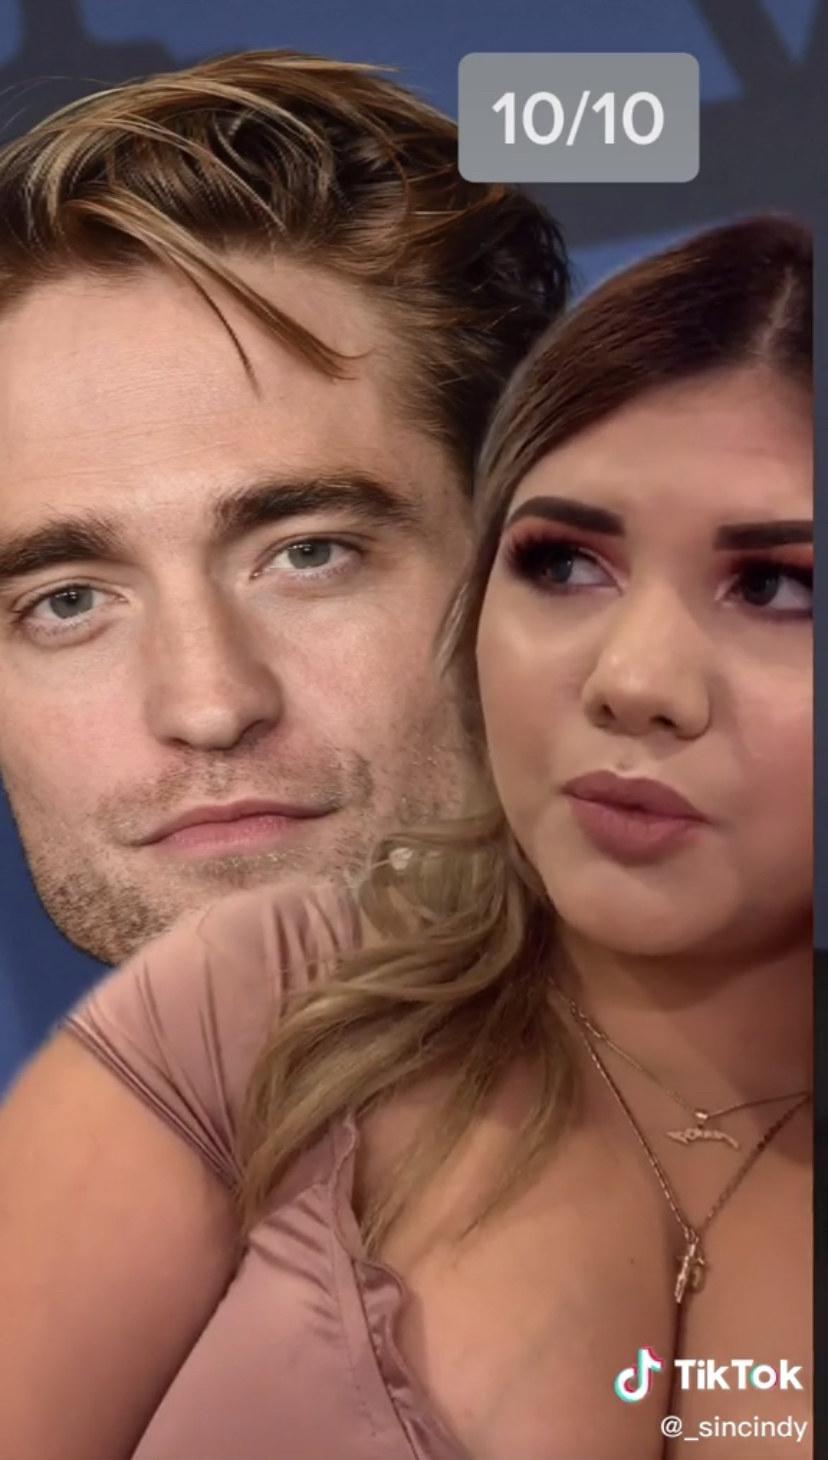 Cindy ranking Robert Pattinson 10/10